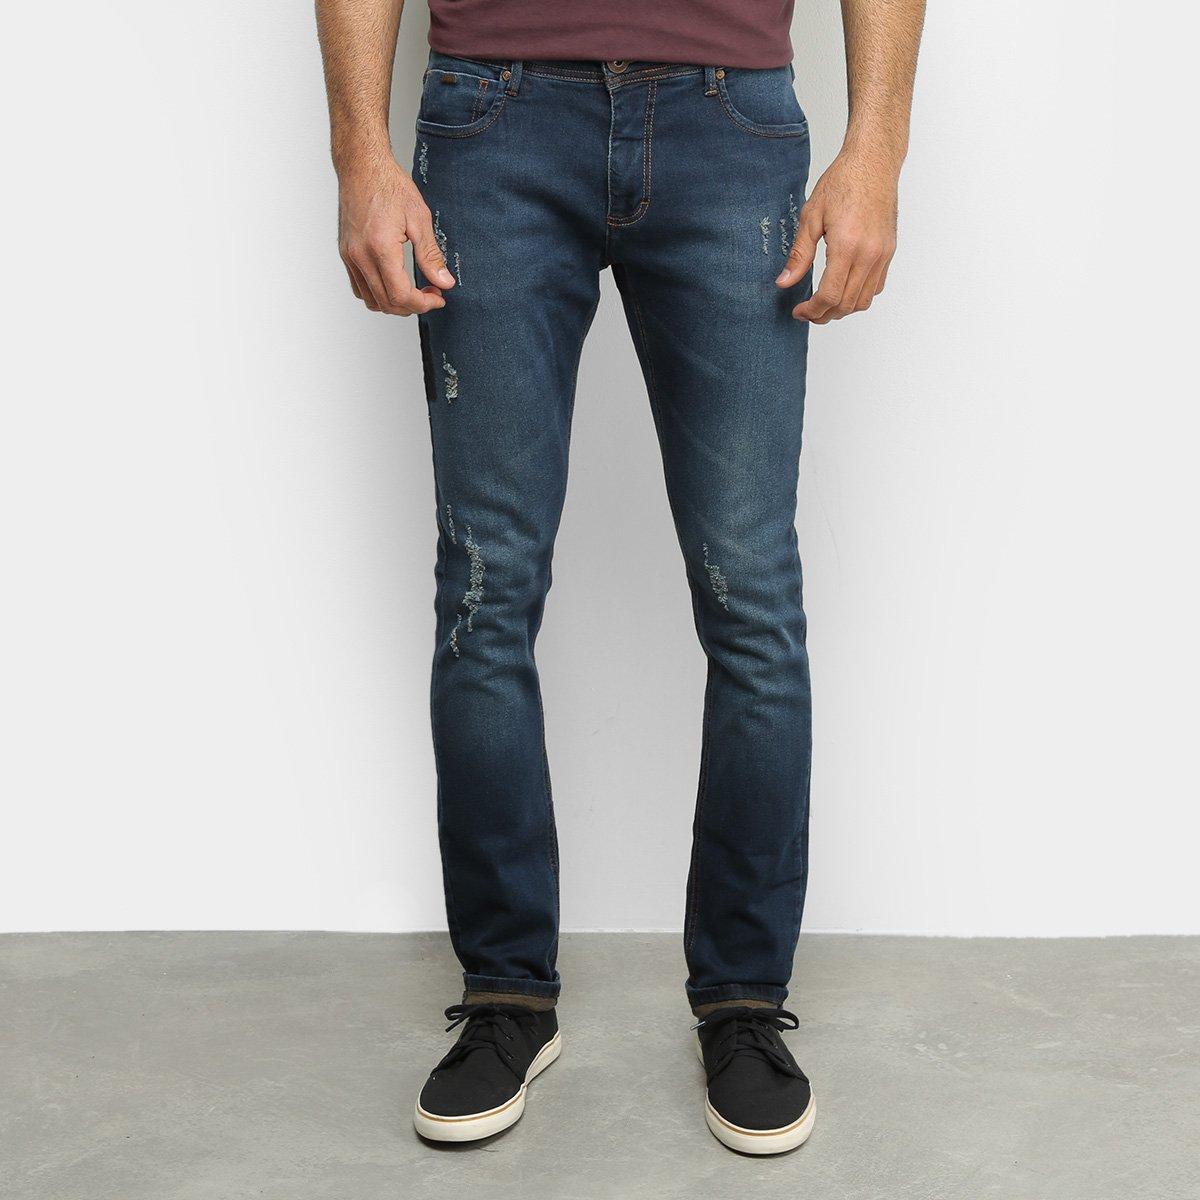 Calça Jeans Forum Skinny Destroyed Masculina